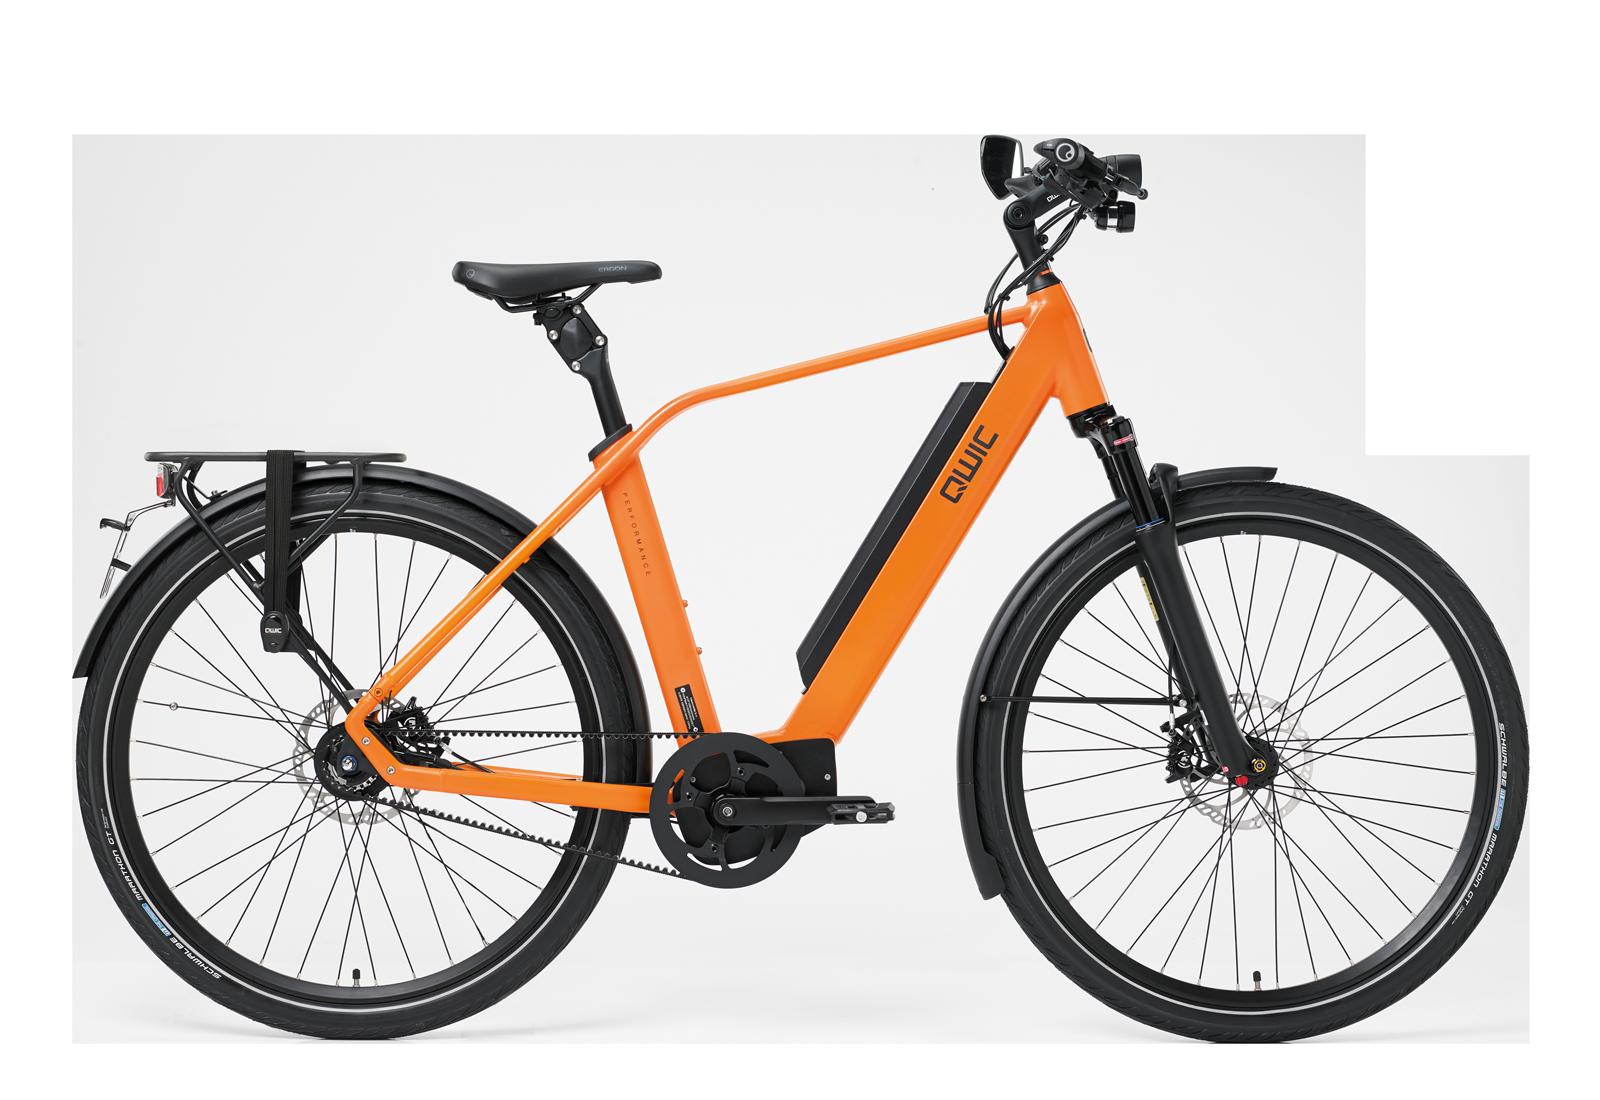 2019_Vrijstaand_sideview_Performance_MA11speed_Diamond_Dutch-orange